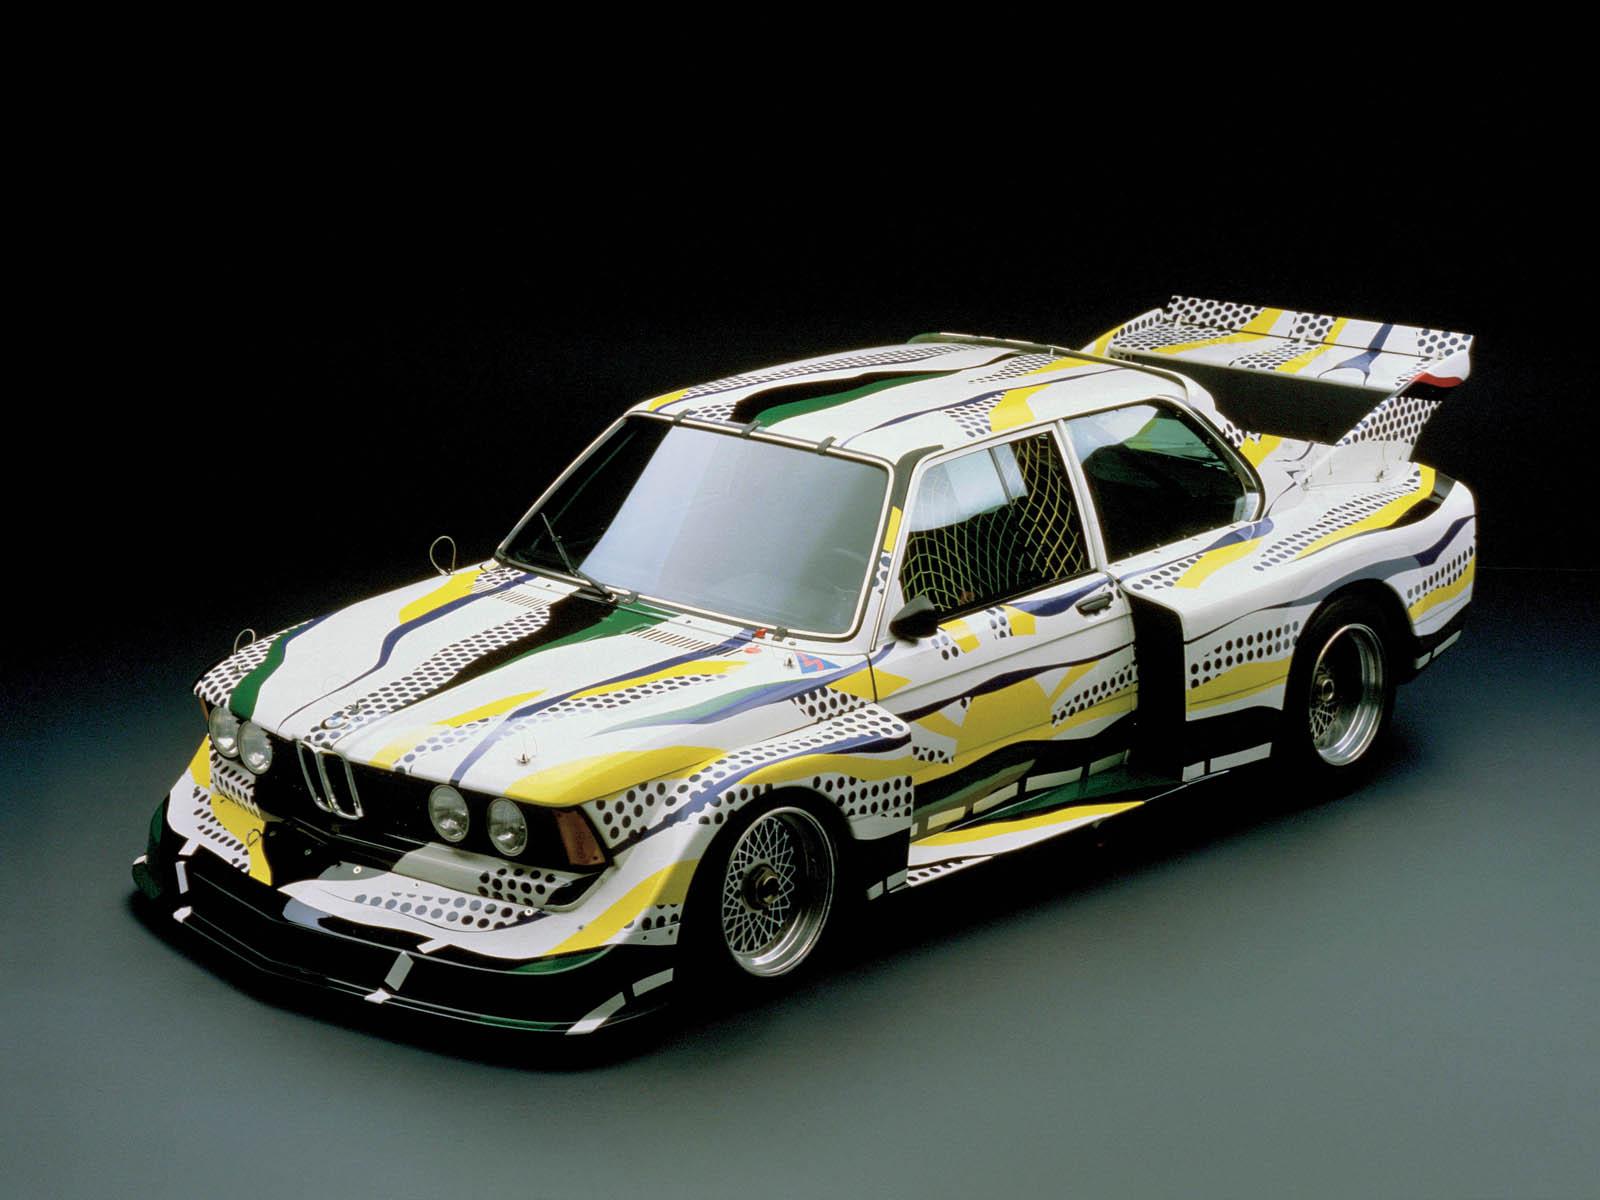 3-я машина из коллекции BMW Art cars - BMW 320i